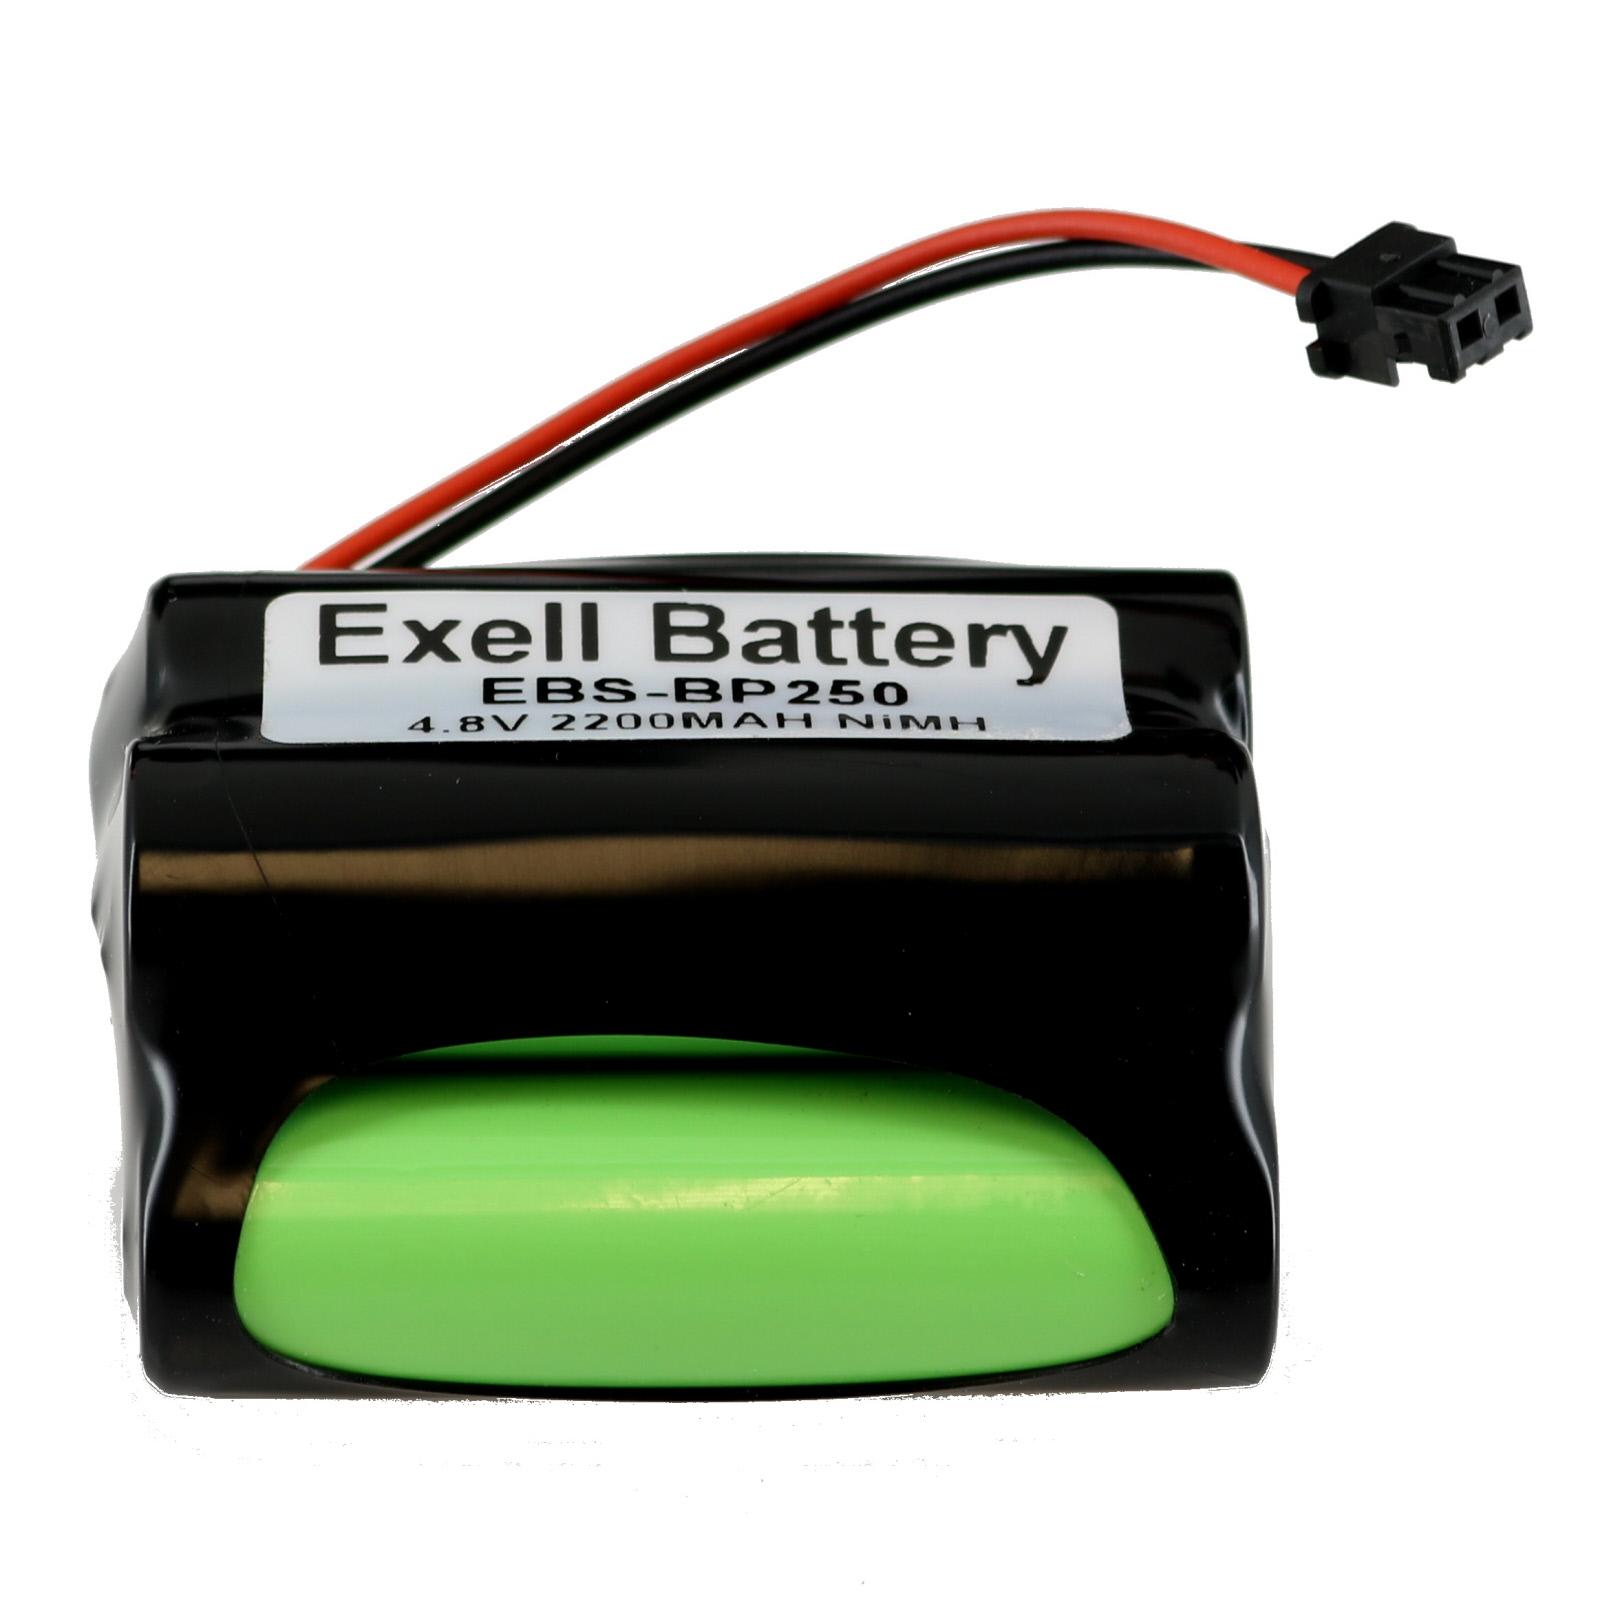 Pro-90 BP120 BP180 BP250 BP150 Replacement Battery for Radio Shack 20-520